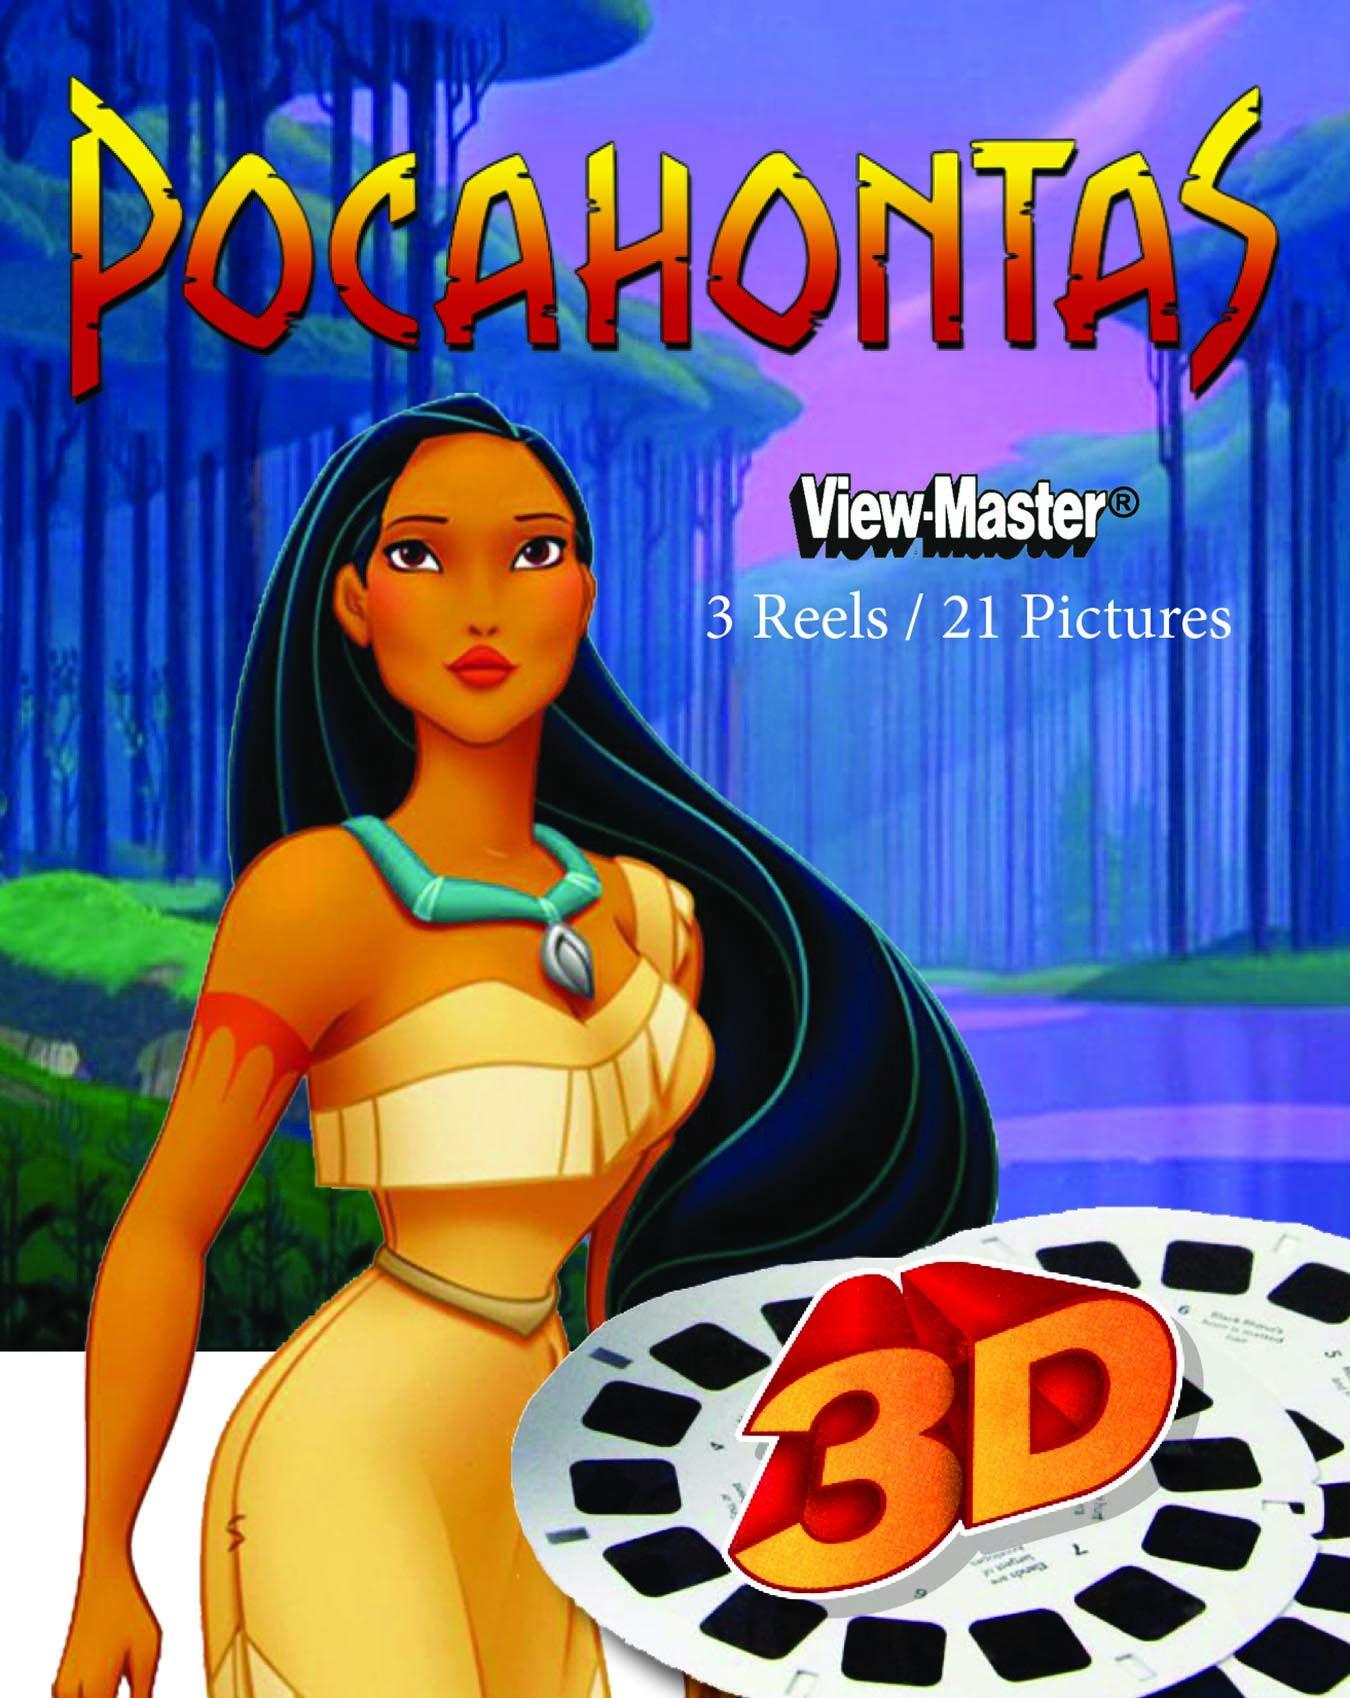 ViewMaster Disney Pocahontas 3D Reels